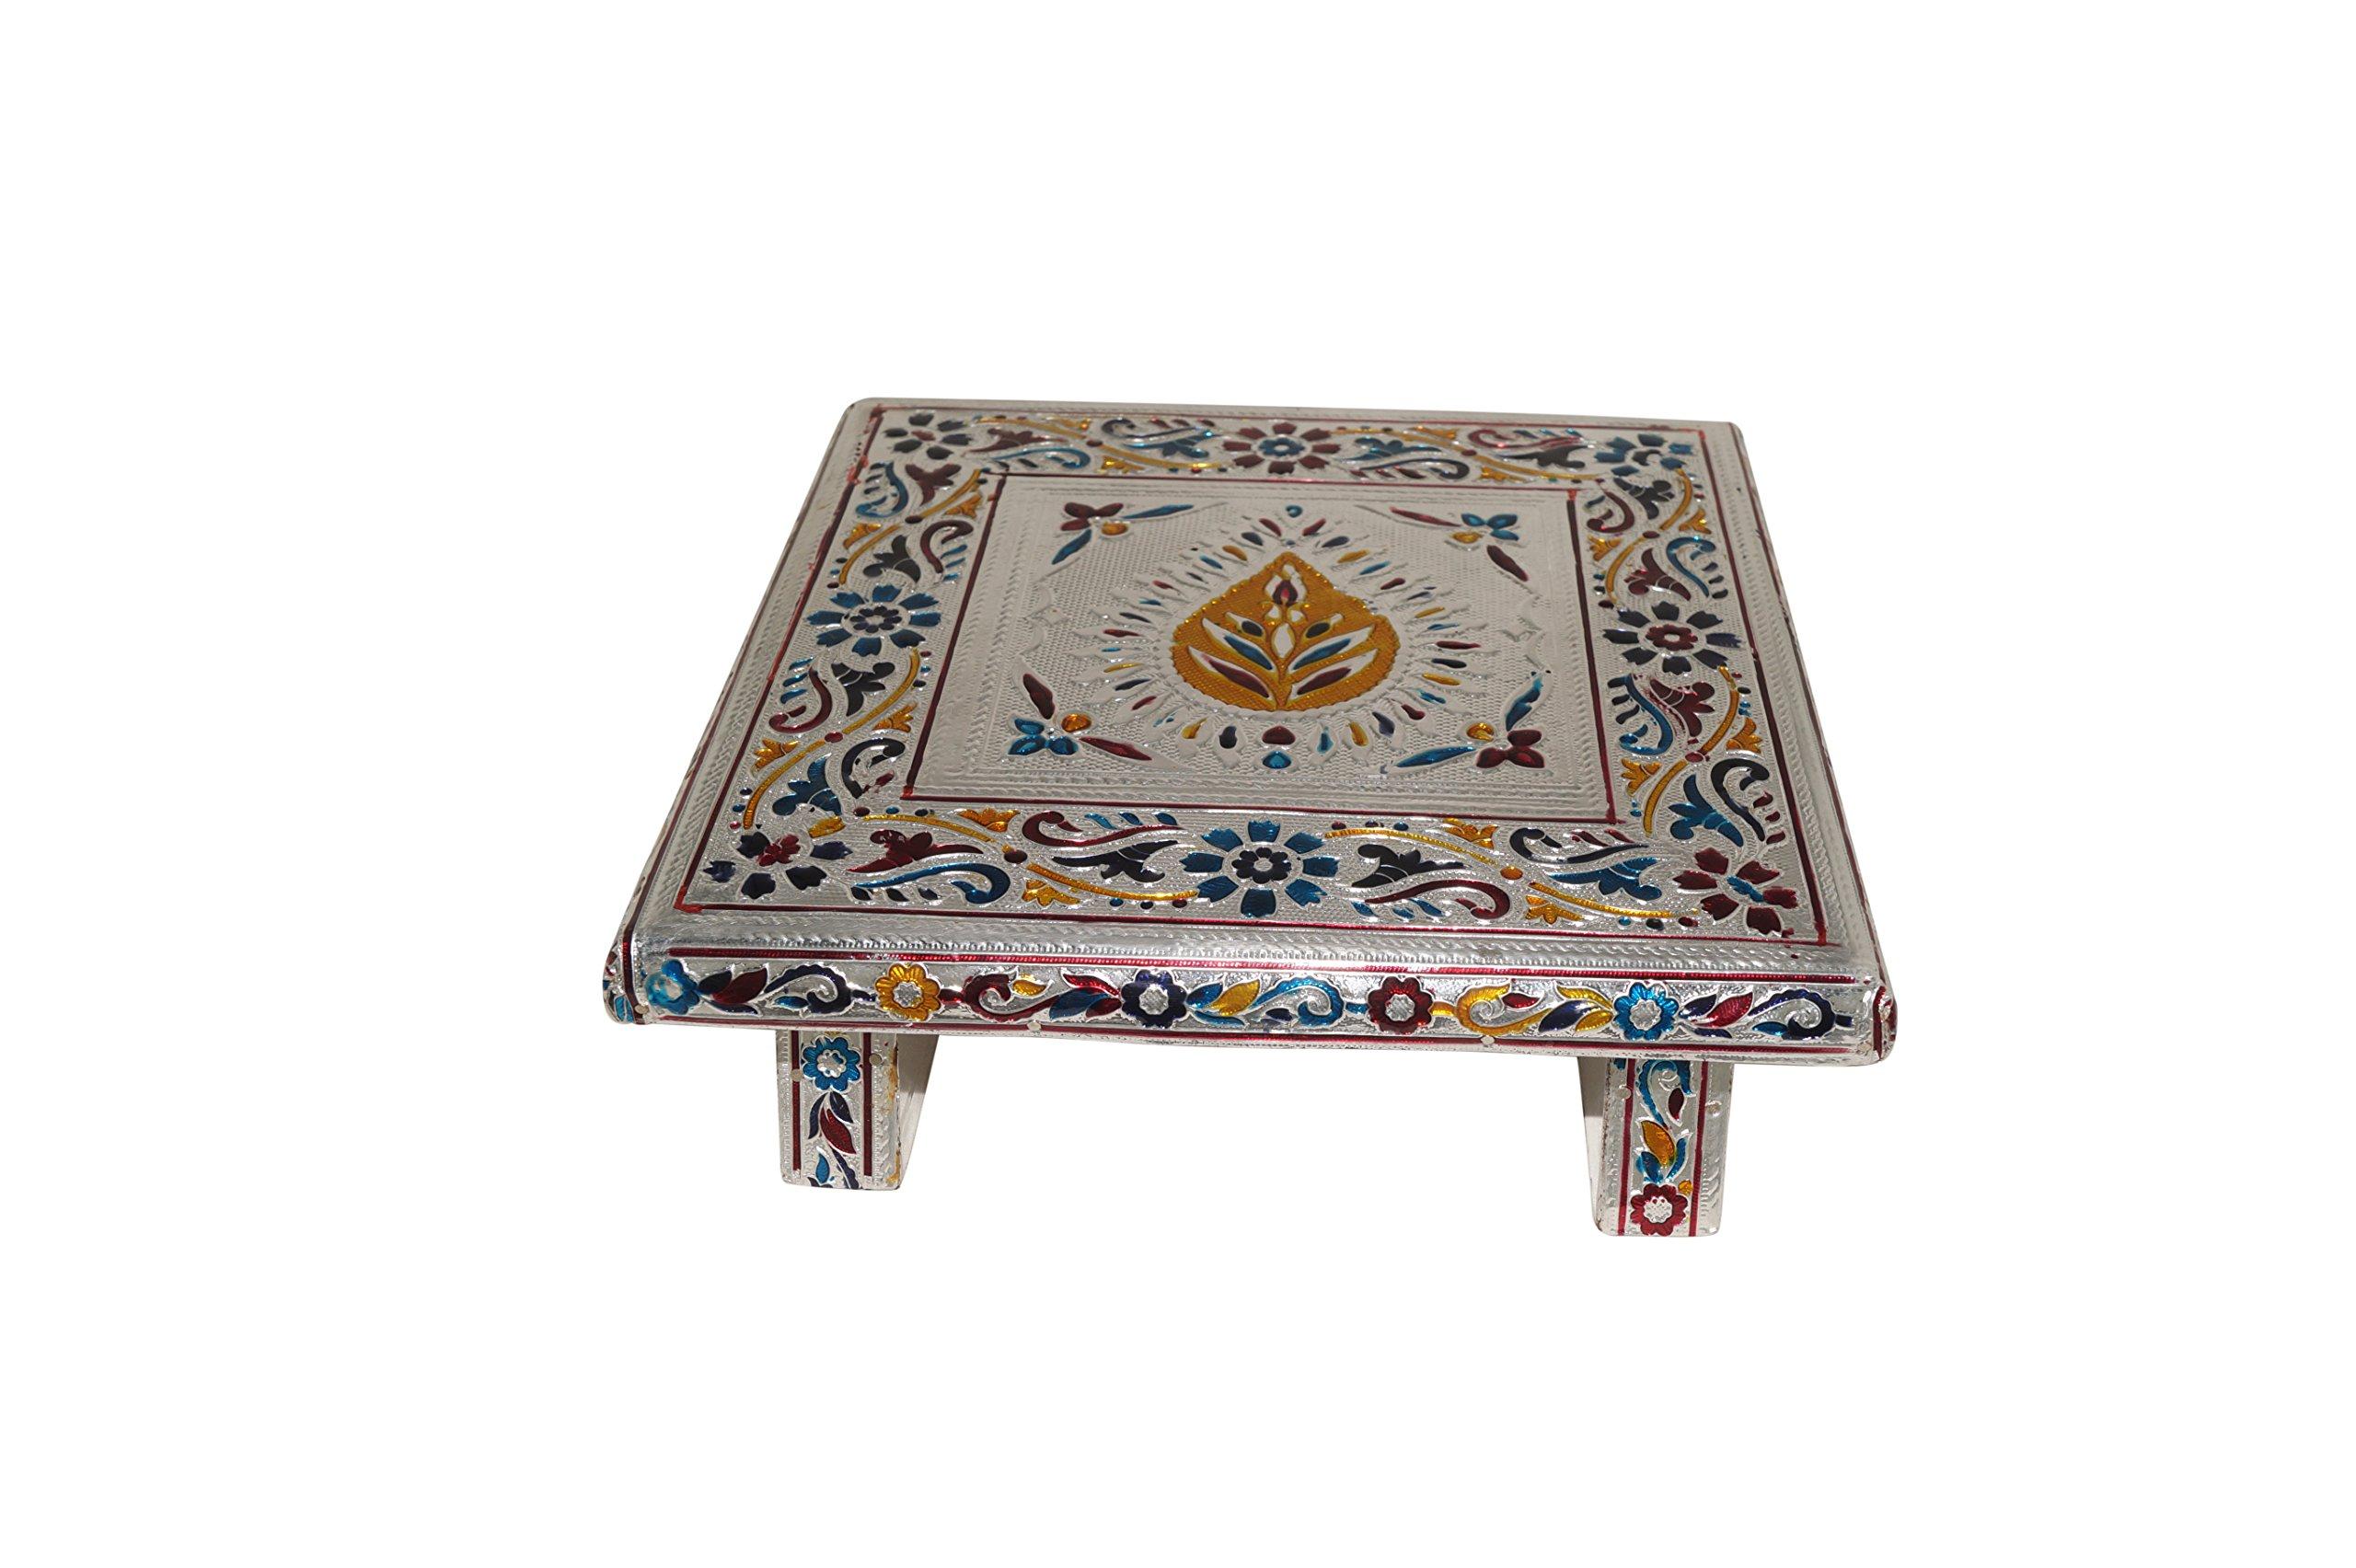 Giri Indian Handmade Minakari Bajot Silver Table (20 mm x 20 mm x 5.5 mm, White)